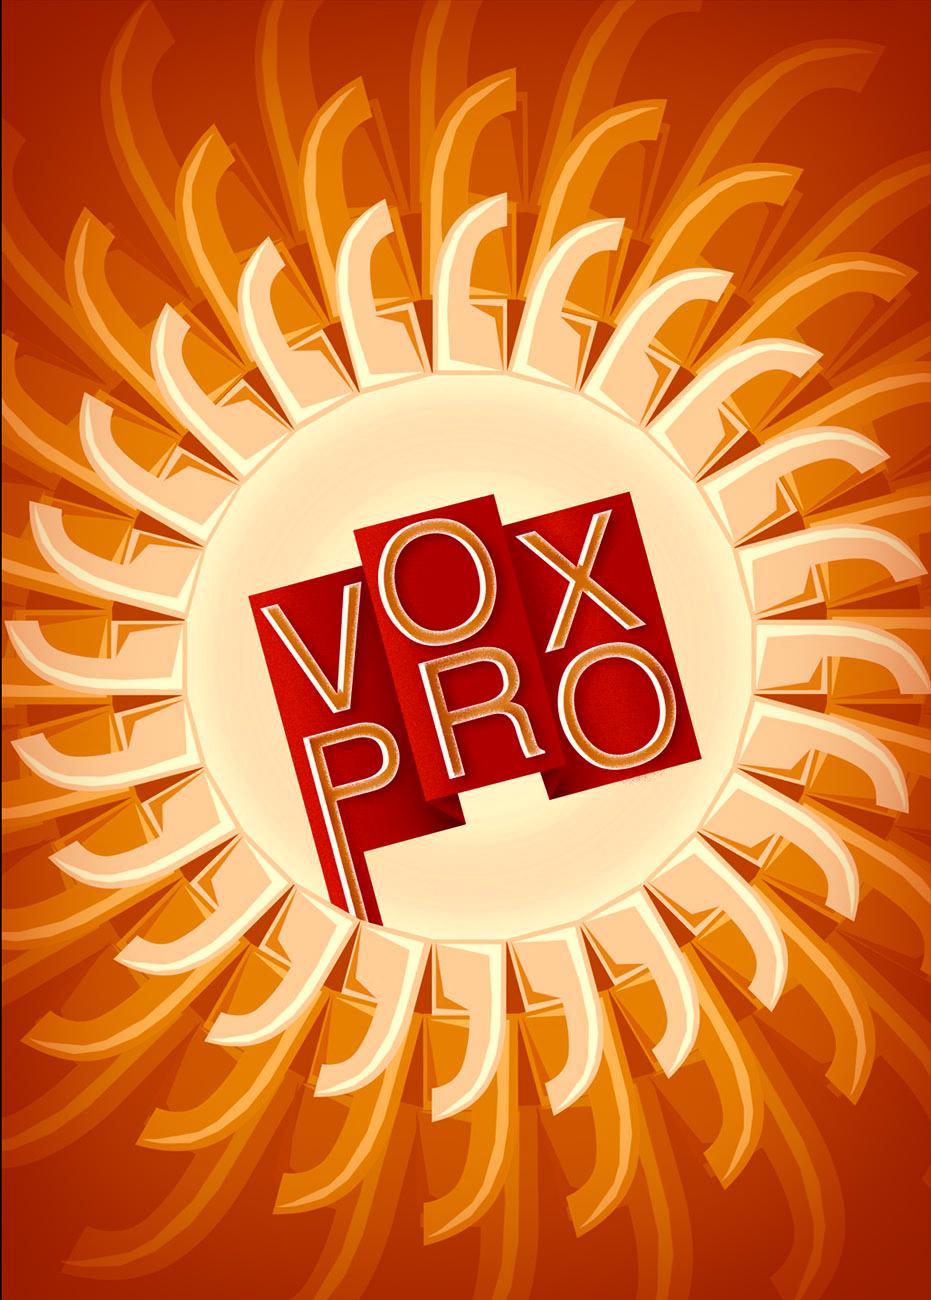 4 Vox ProB.jpg